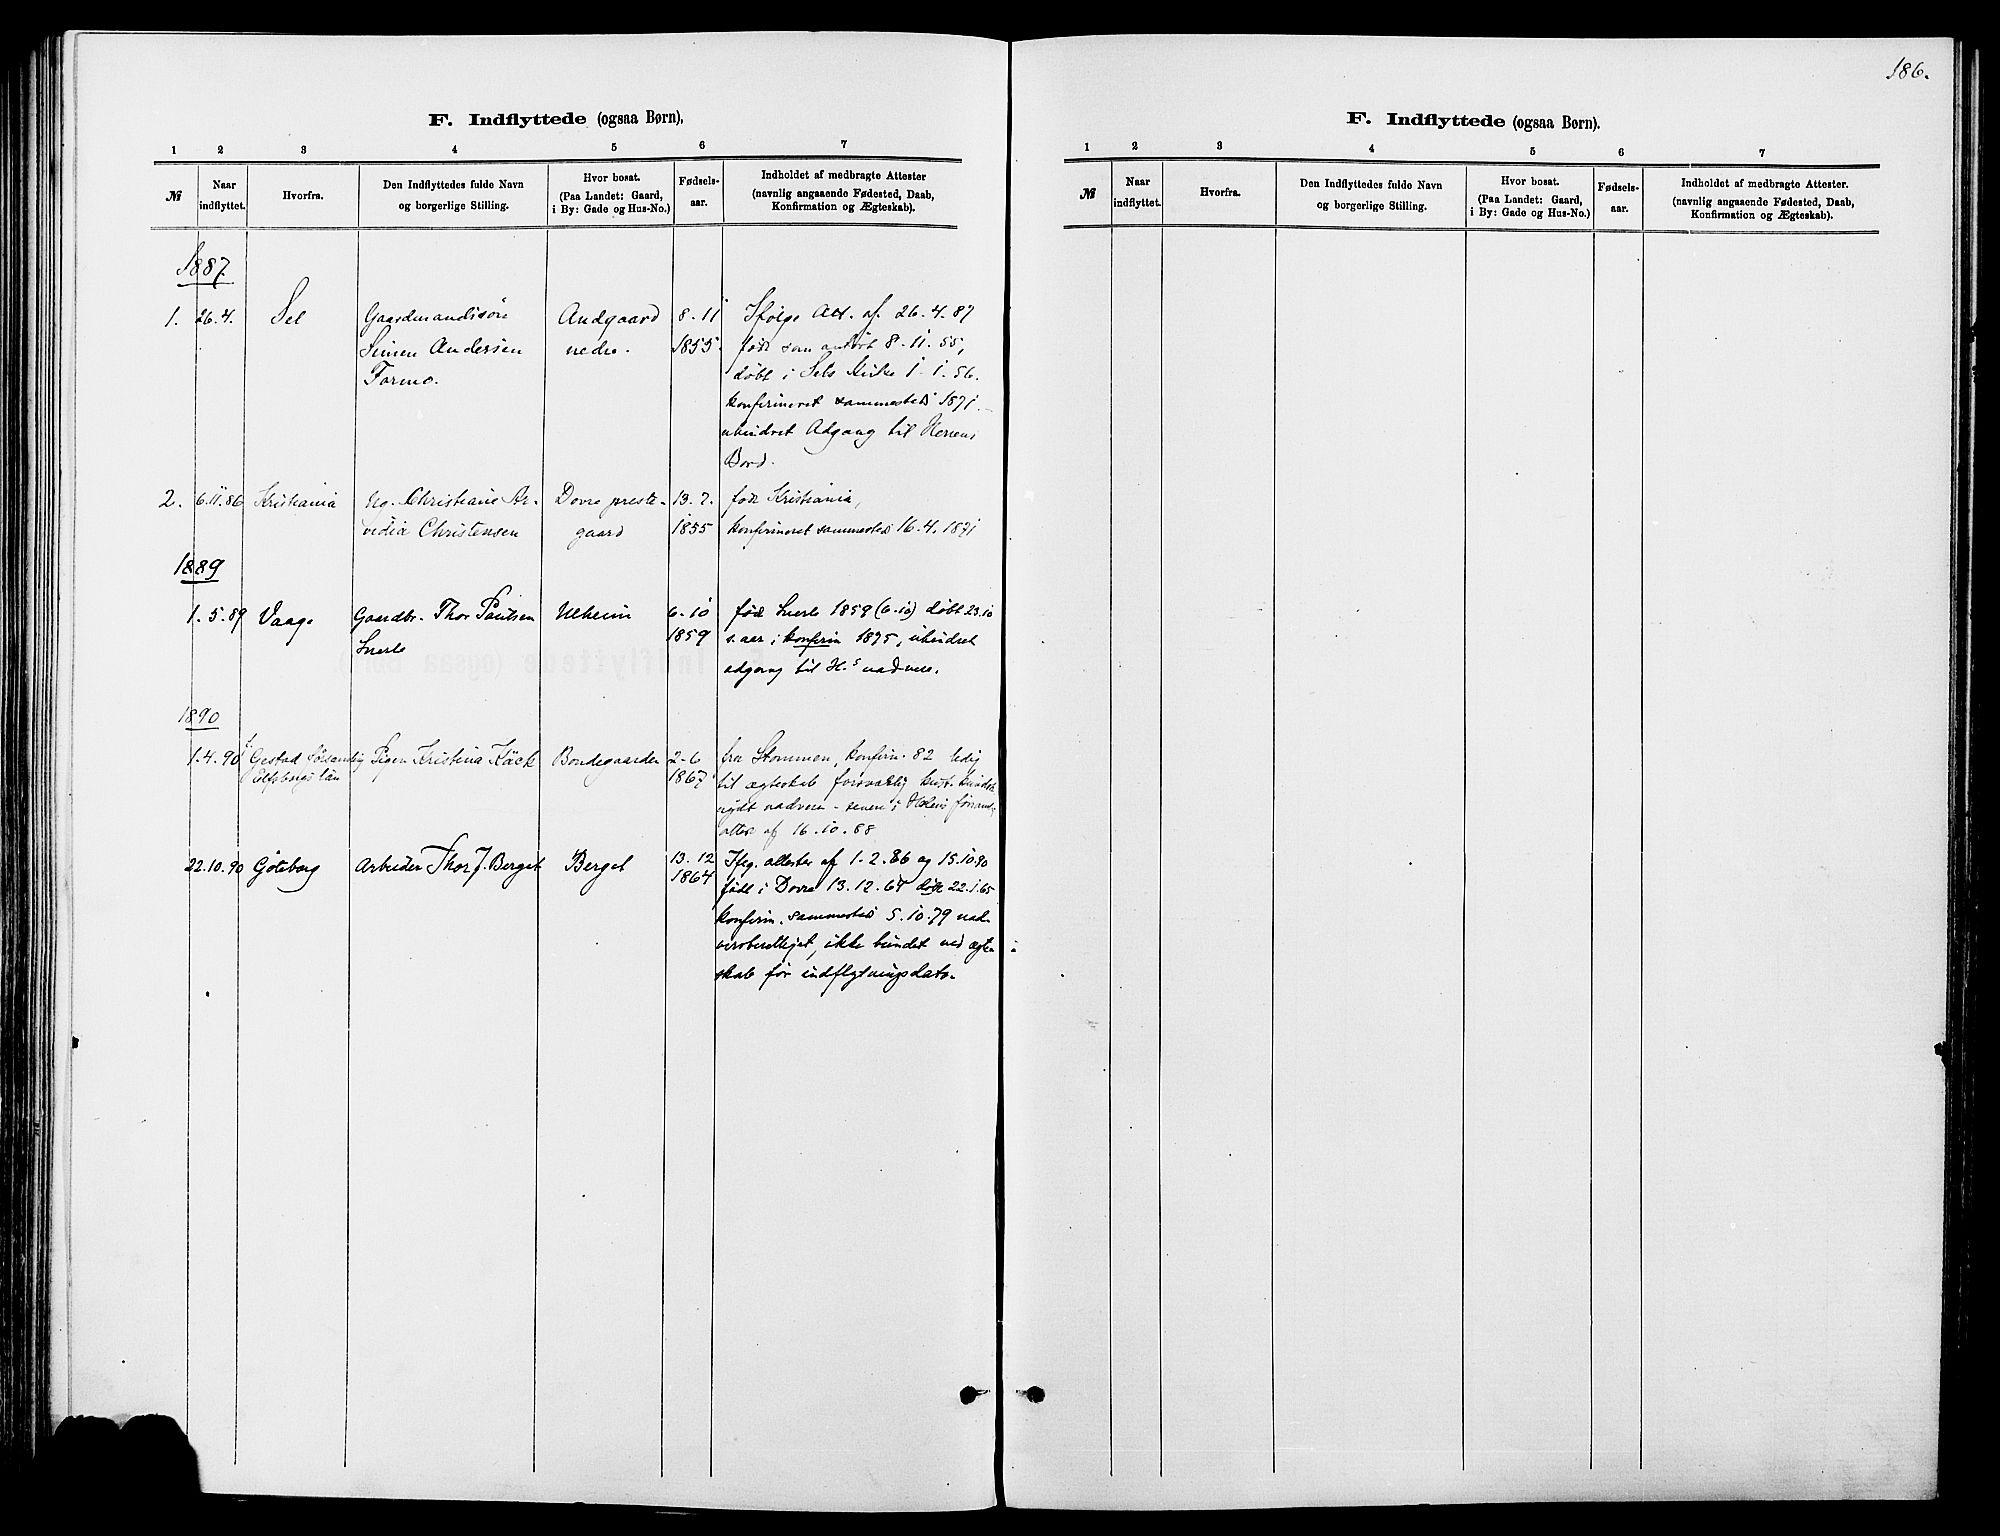 SAH, Dovre prestekontor, Ministerialbok nr. 2, 1879-1890, s. 186